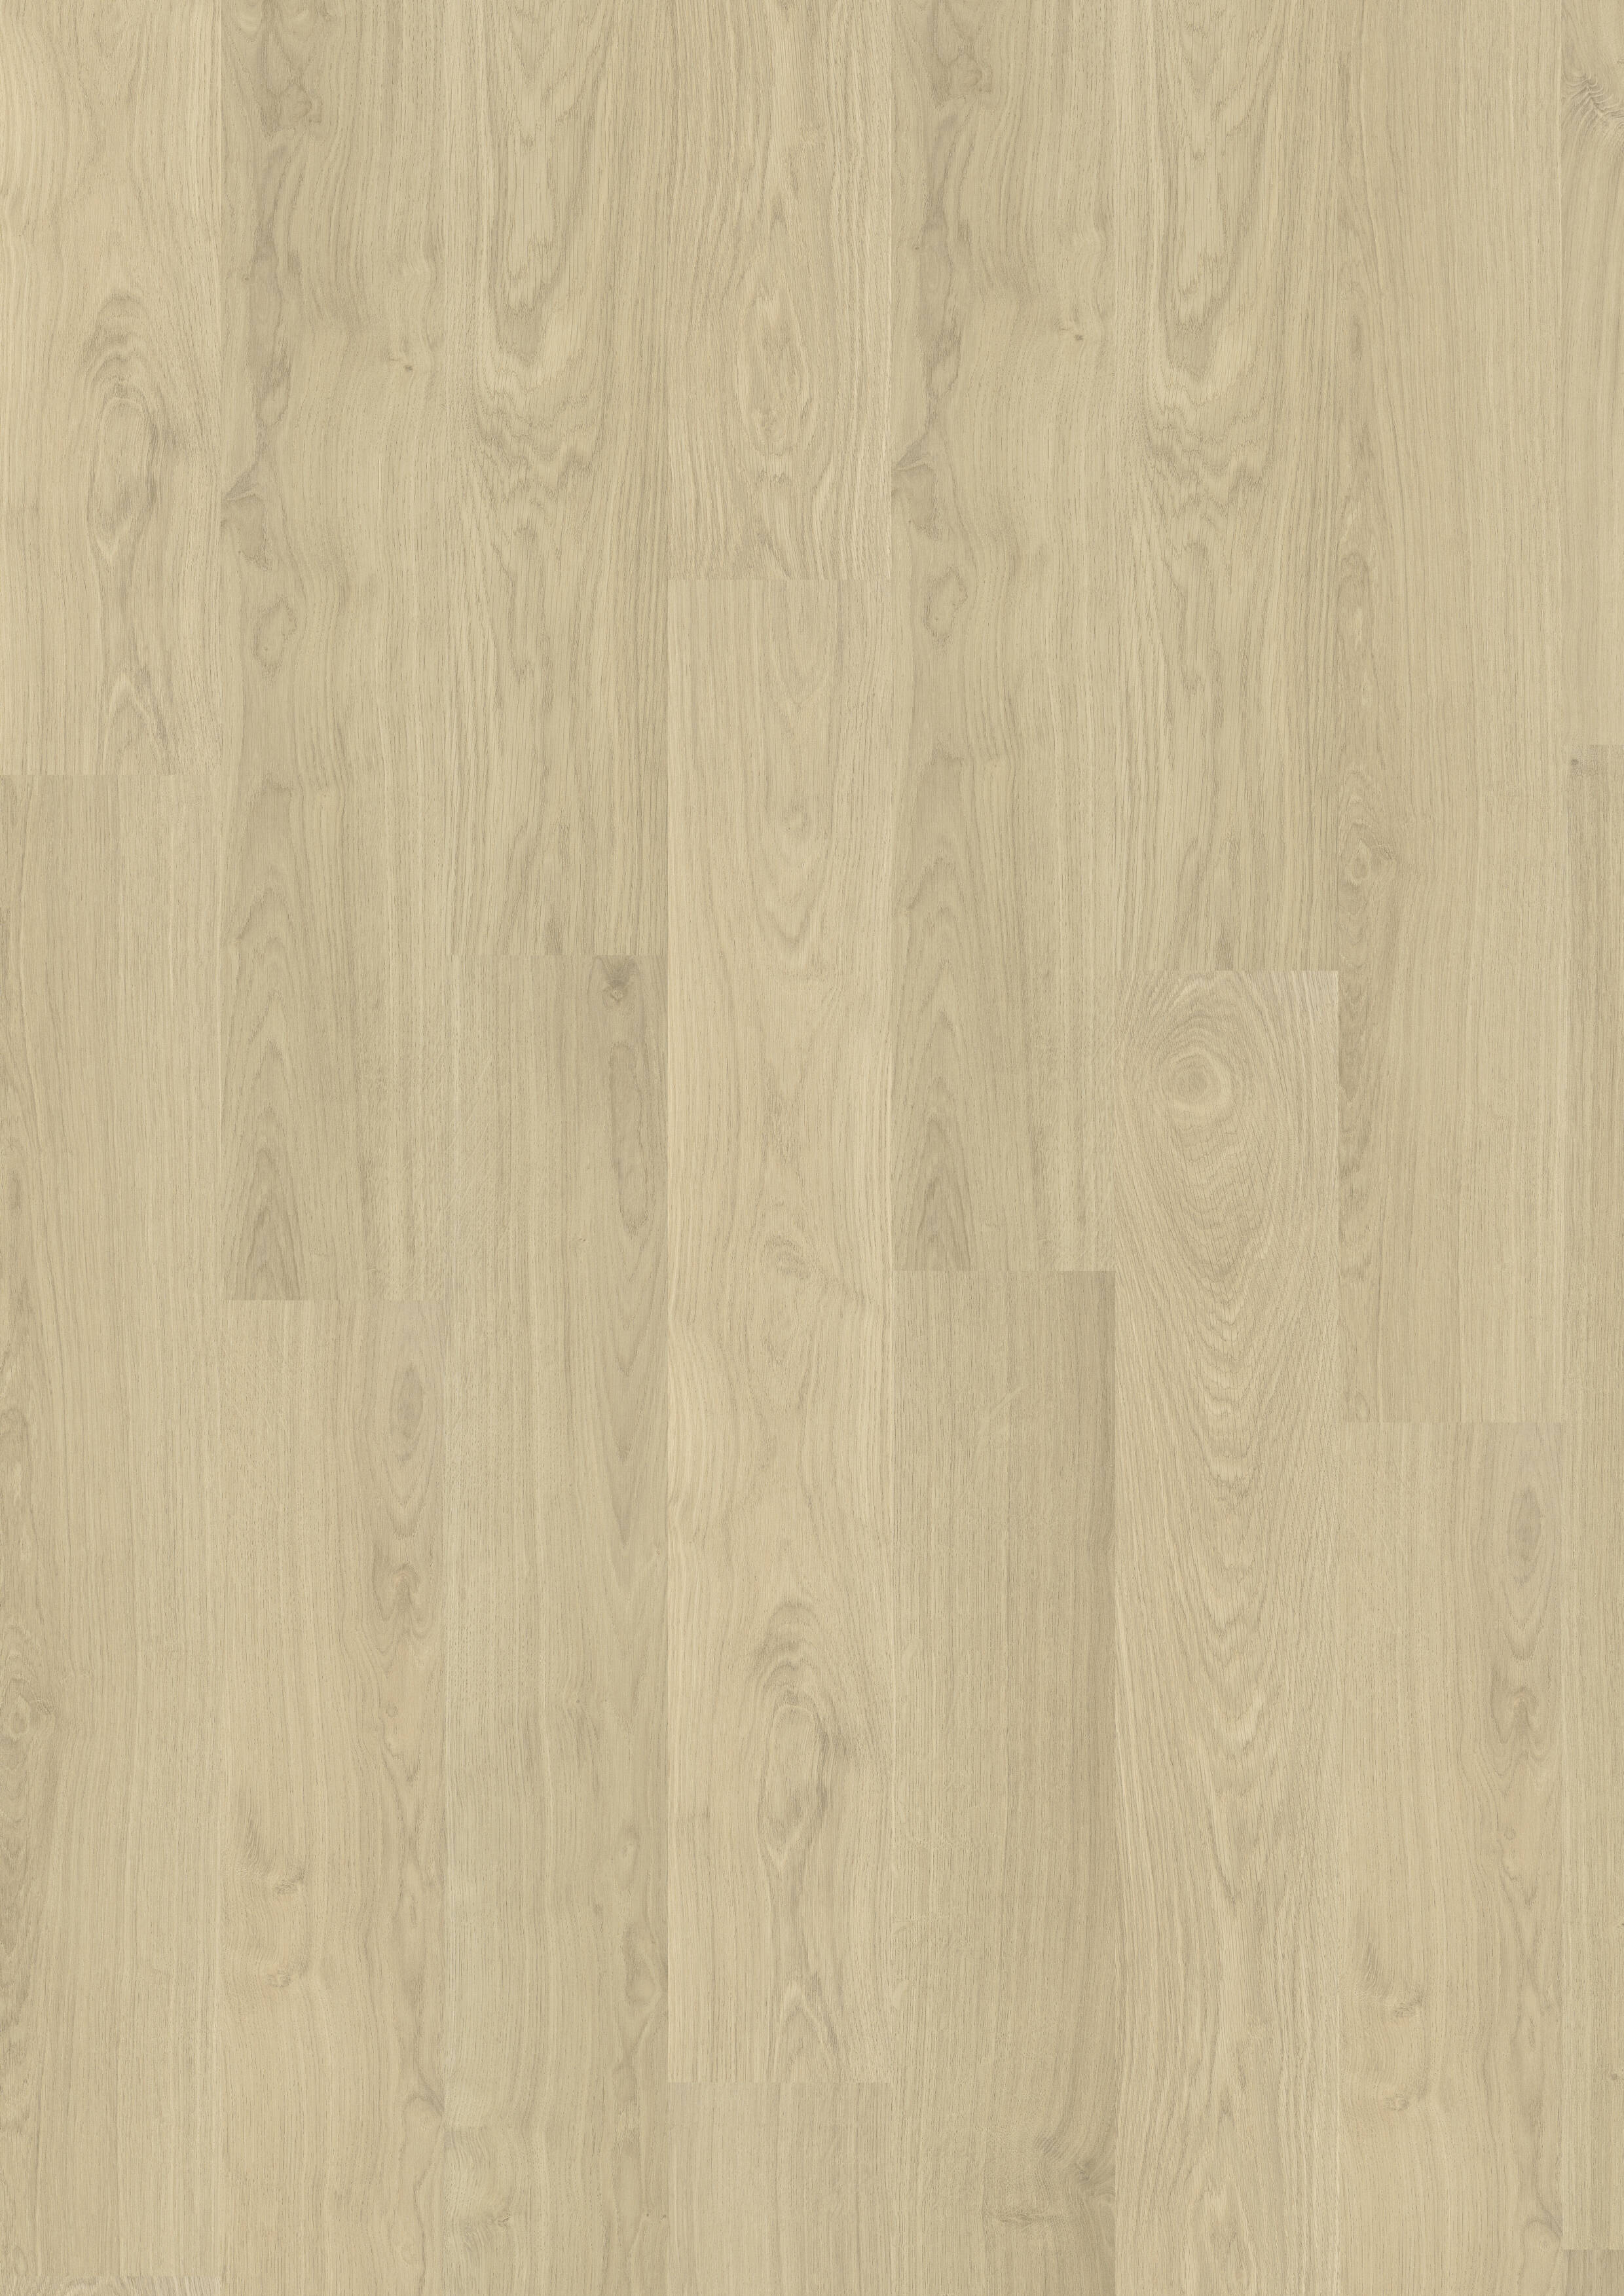 4839 - Oak Authentic 1-Stab